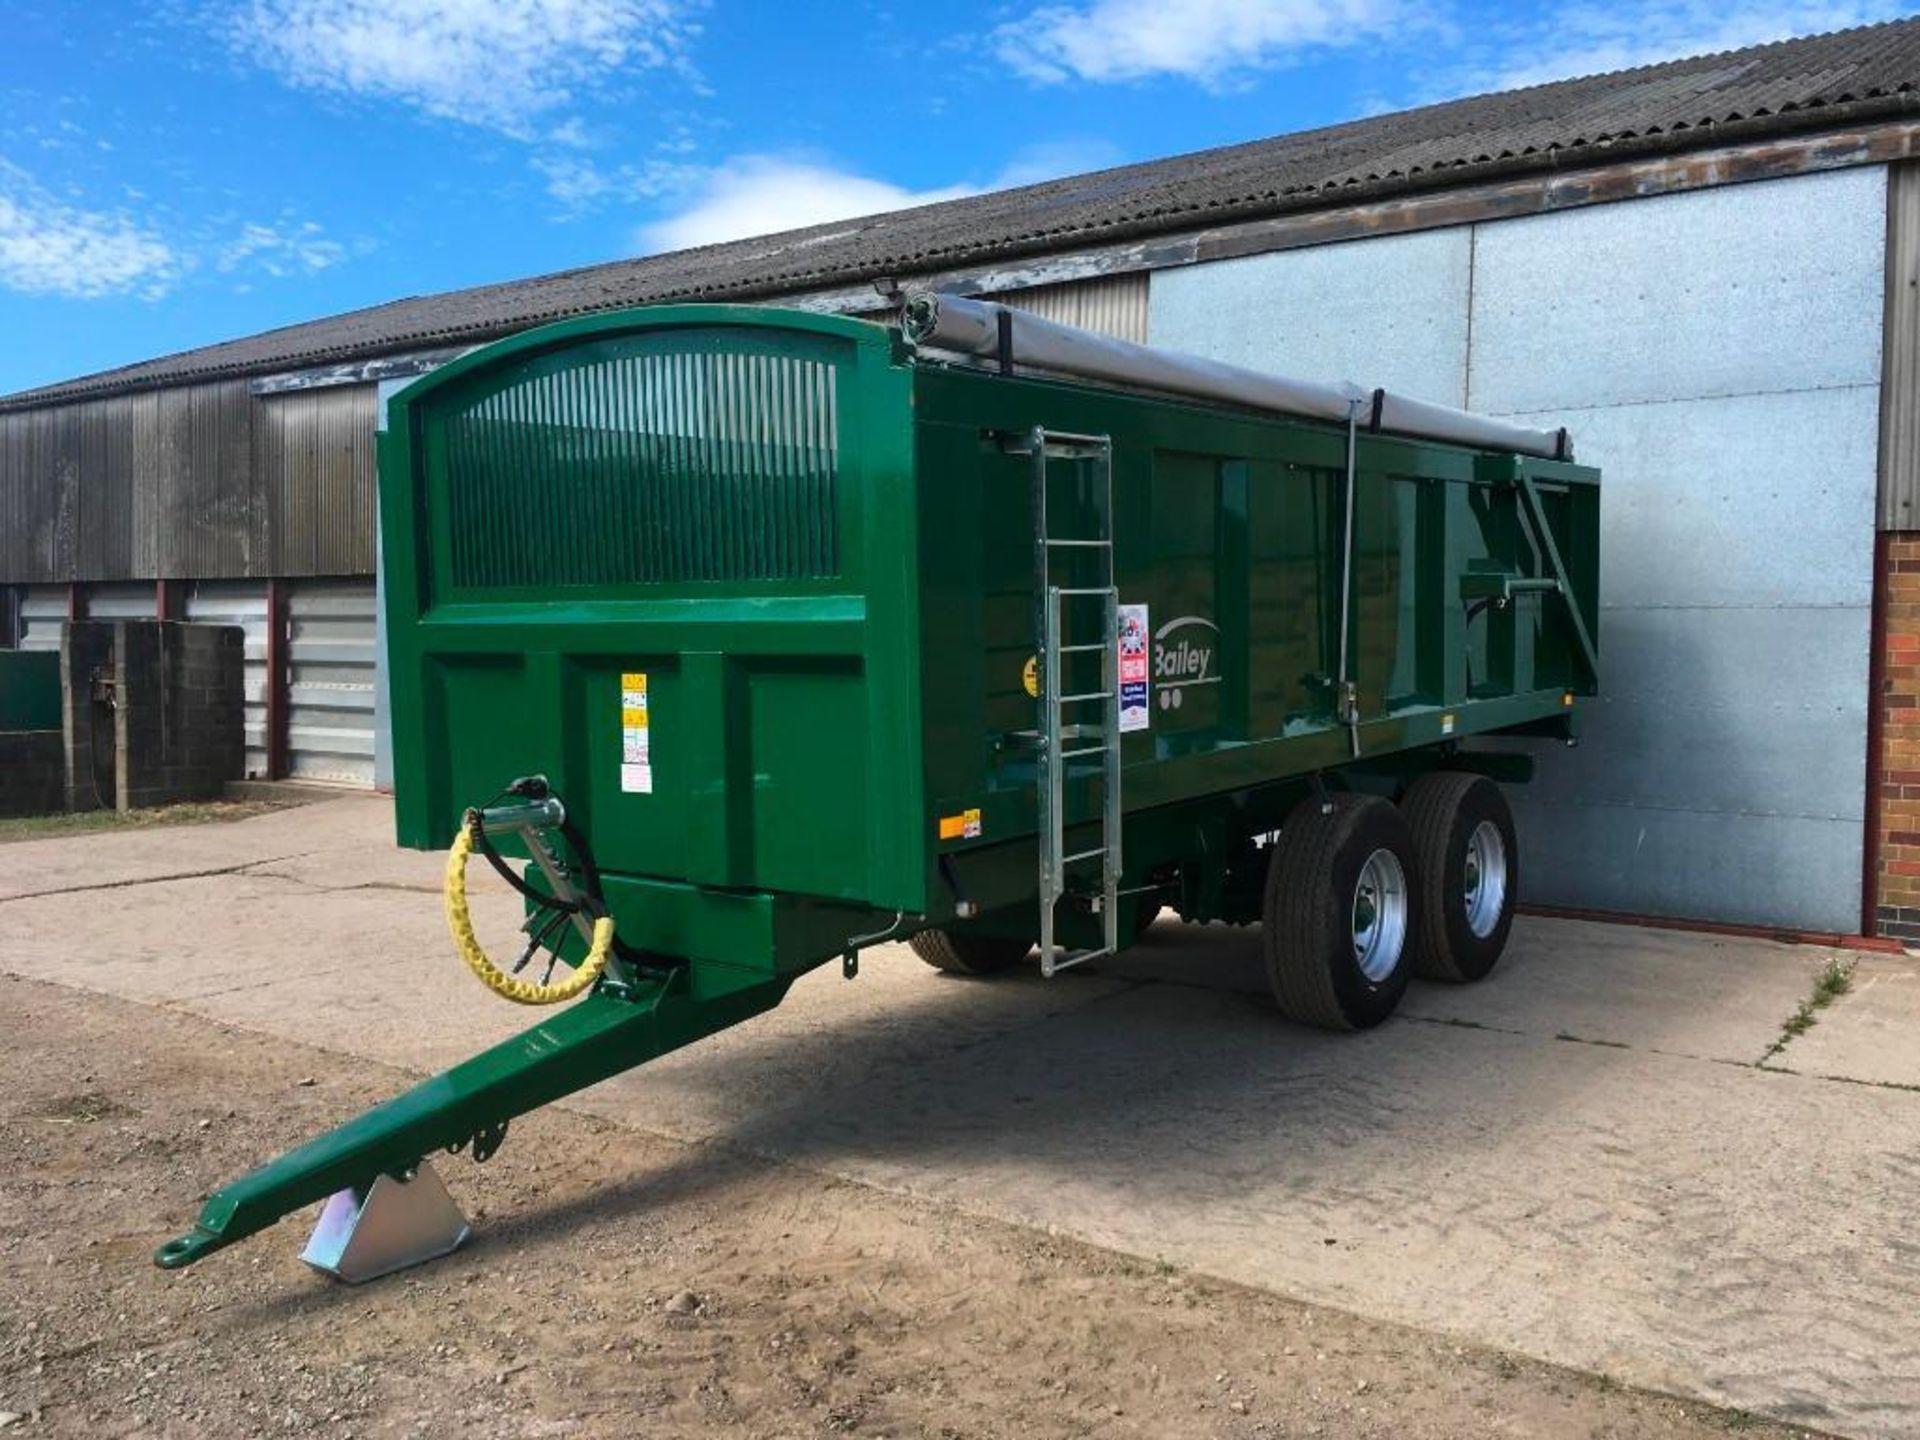 2018 Bailey 14t twin axle trailer, hydraulic back door, manual grain chute, rollover sheet, sprung d - Image 5 of 17